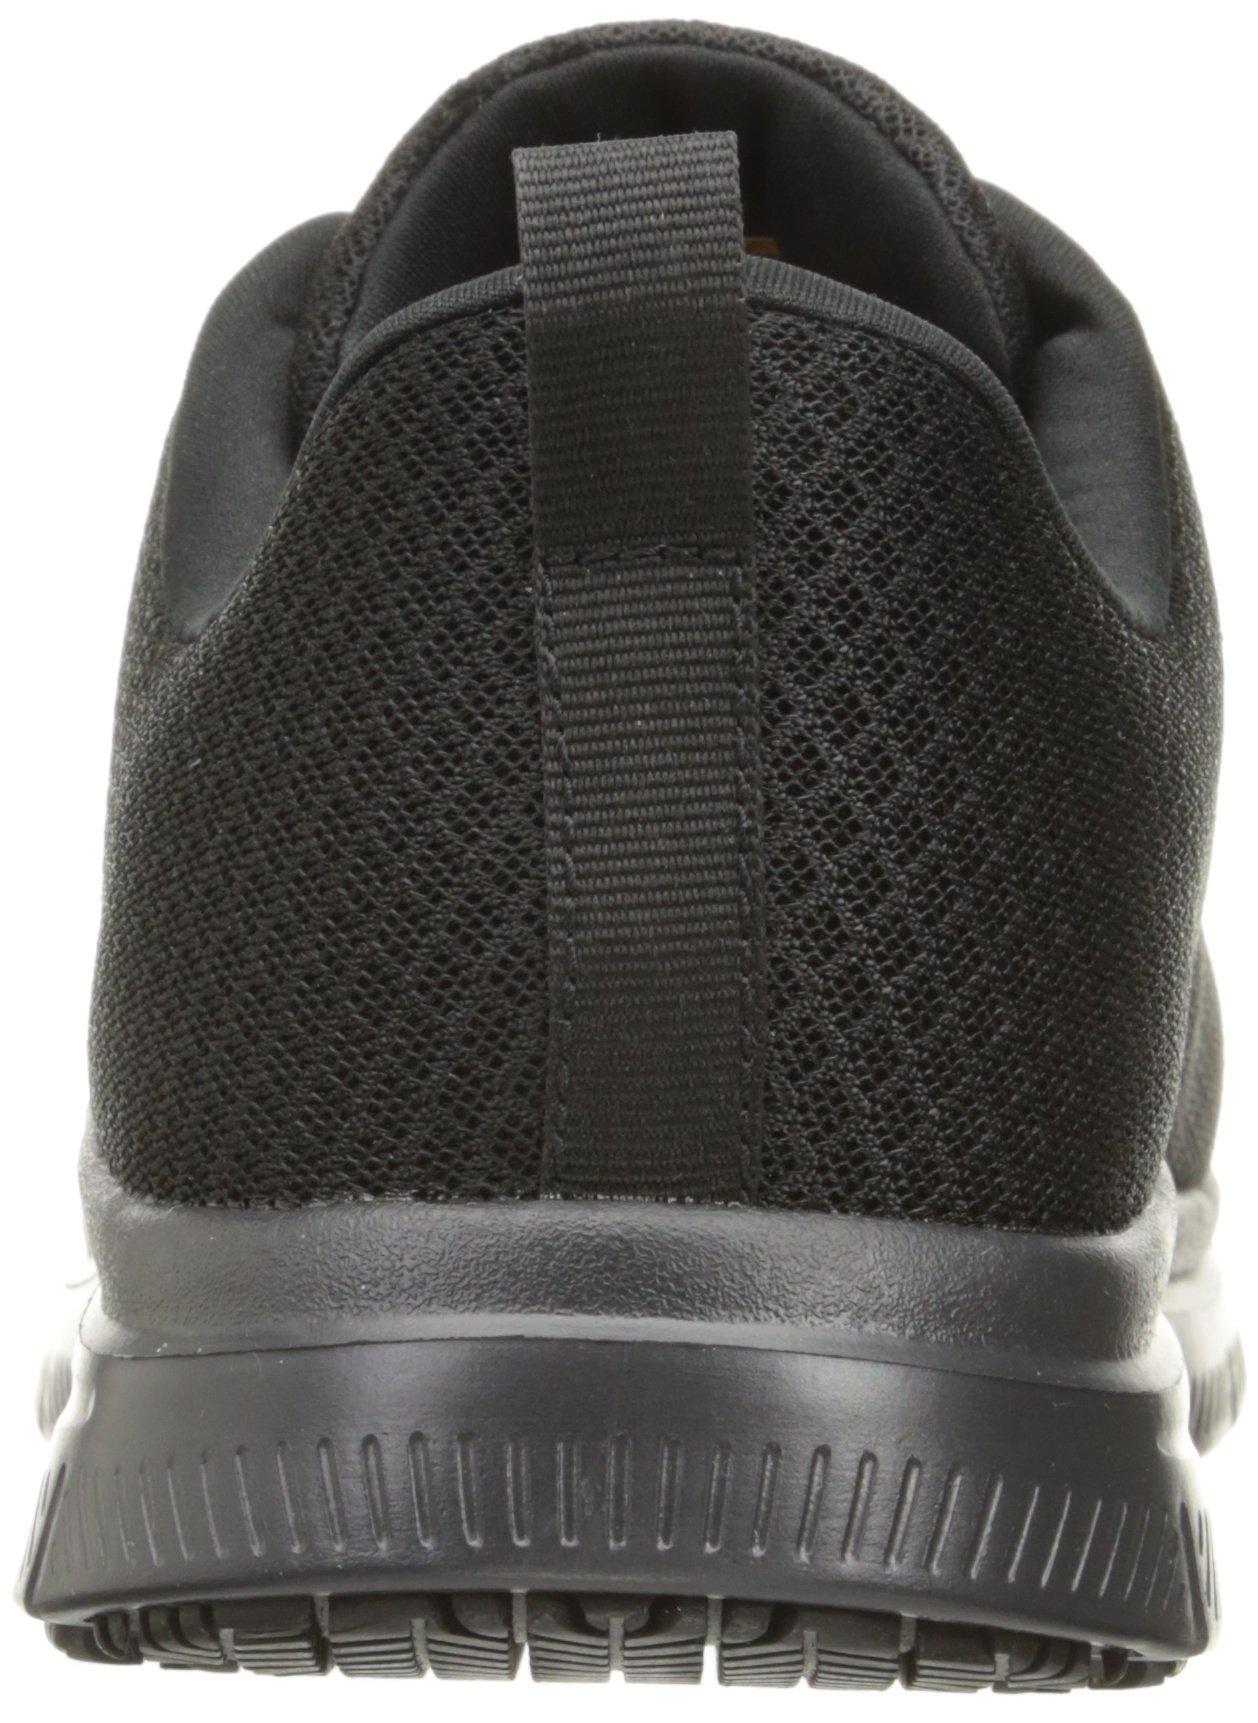 Skechers Men's Flex Advantage Bendon Work Shoe